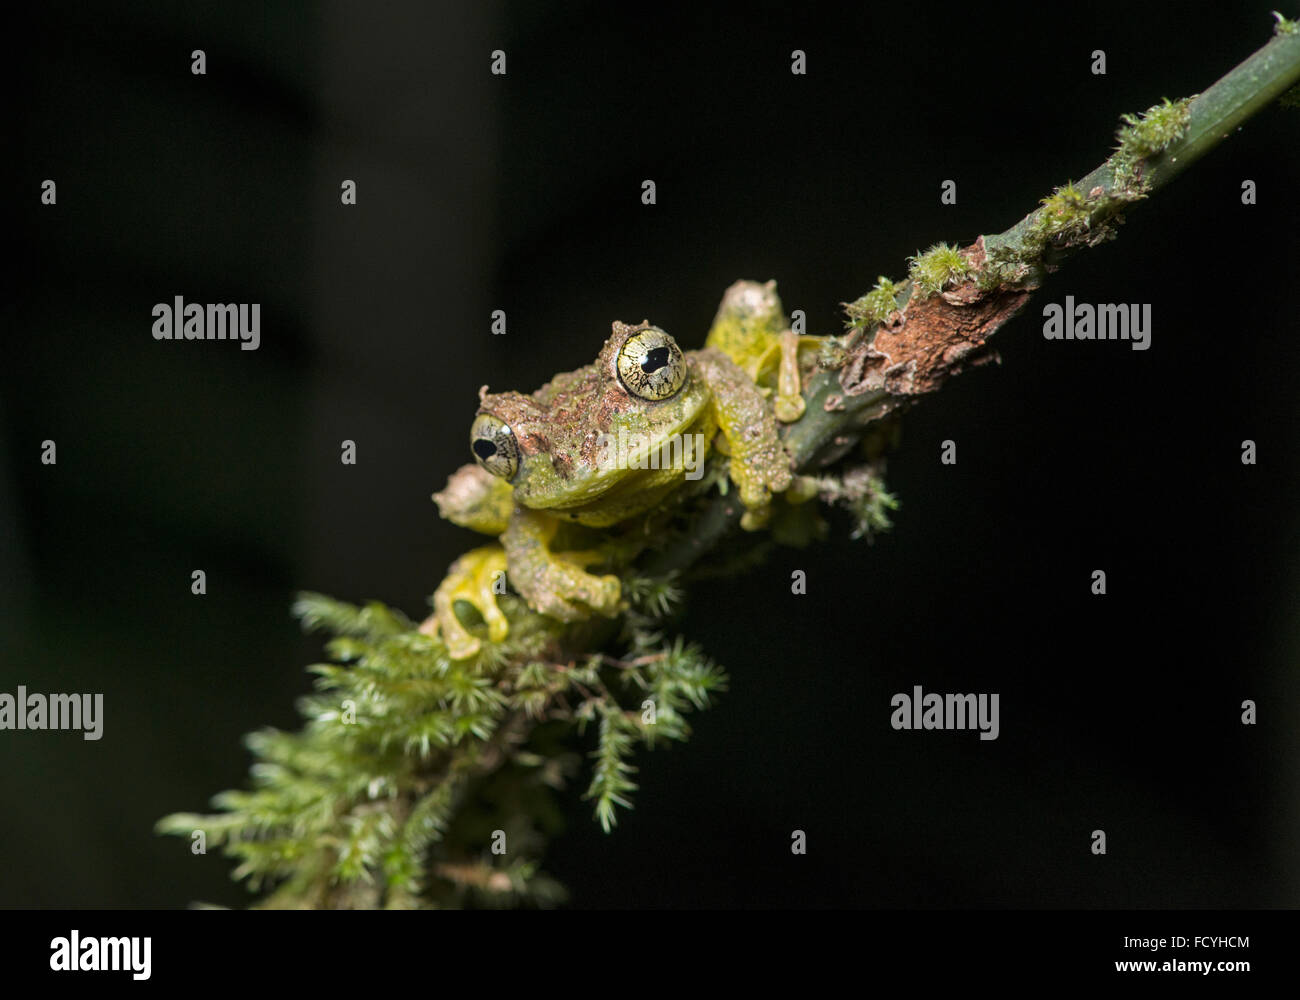 Mossy Tree Frog: Rhacophorus everetti. Sabah, Borneo. Taken at night - Stock Image